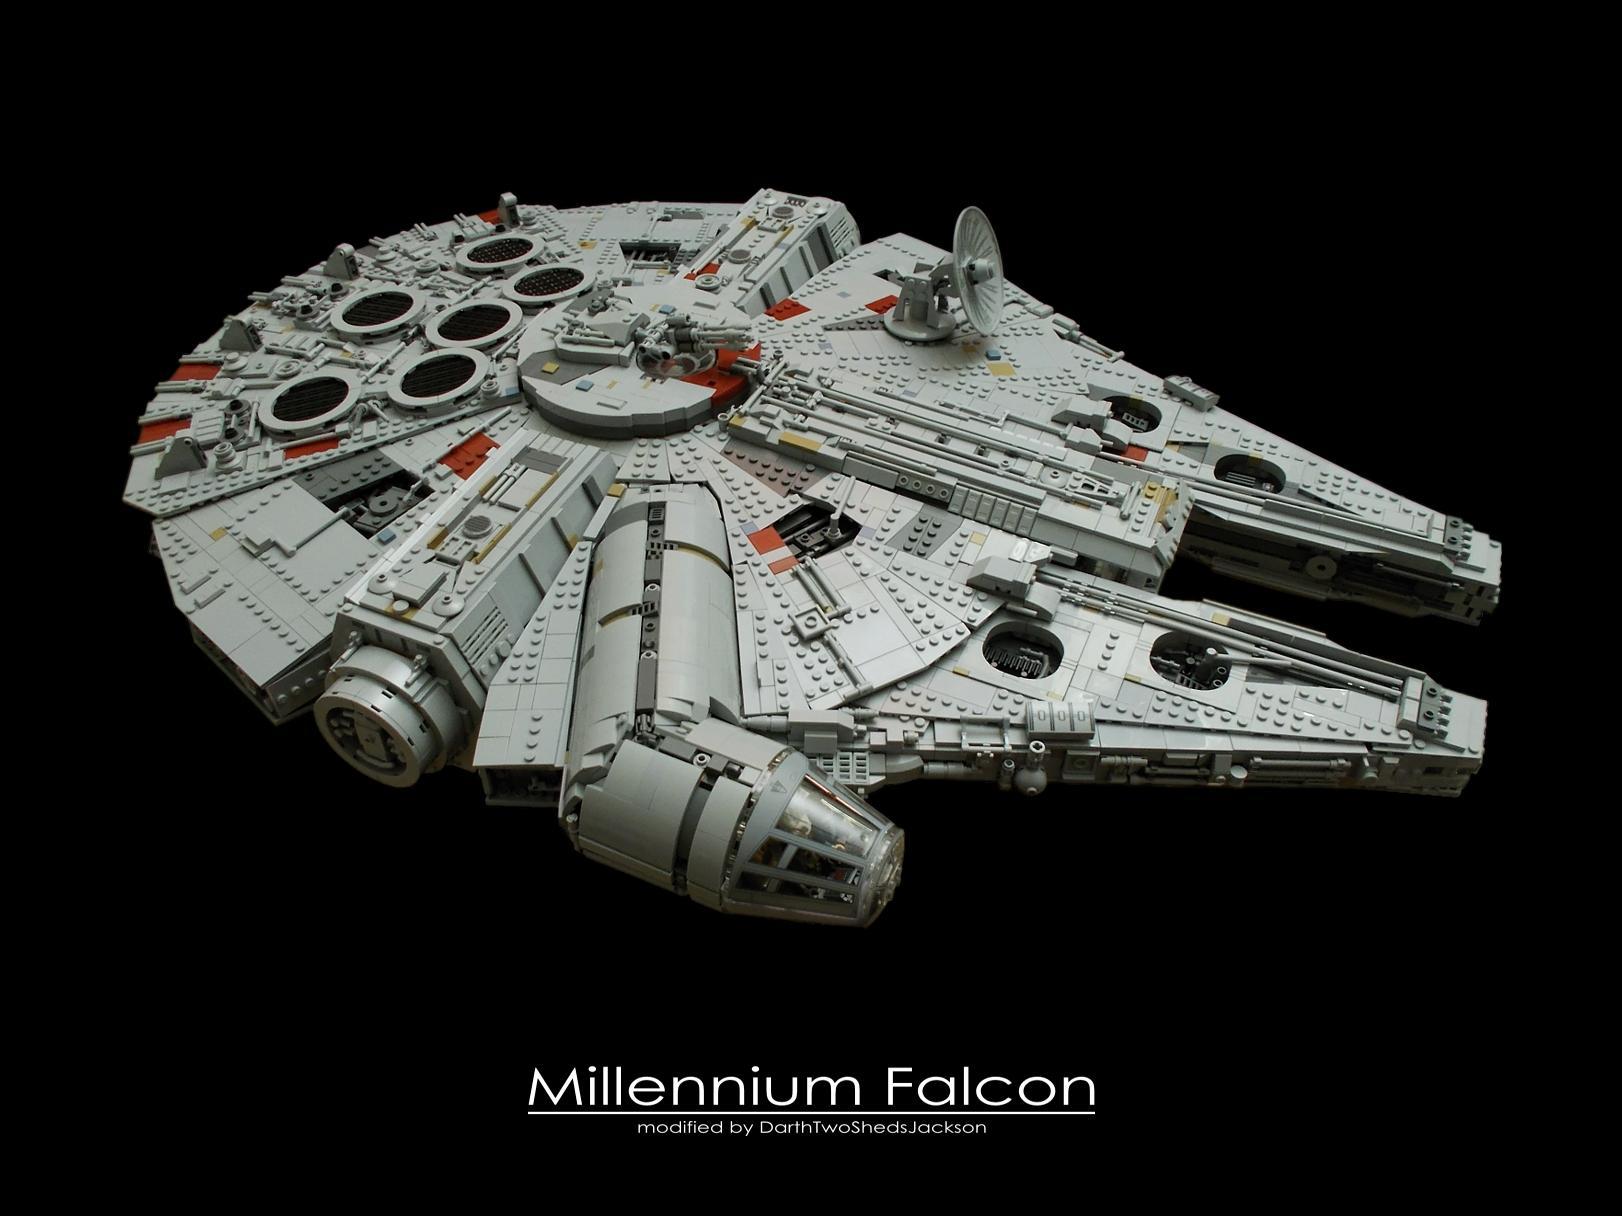 MillenniumFalcon001.jpg.fe1298f506f8d26c